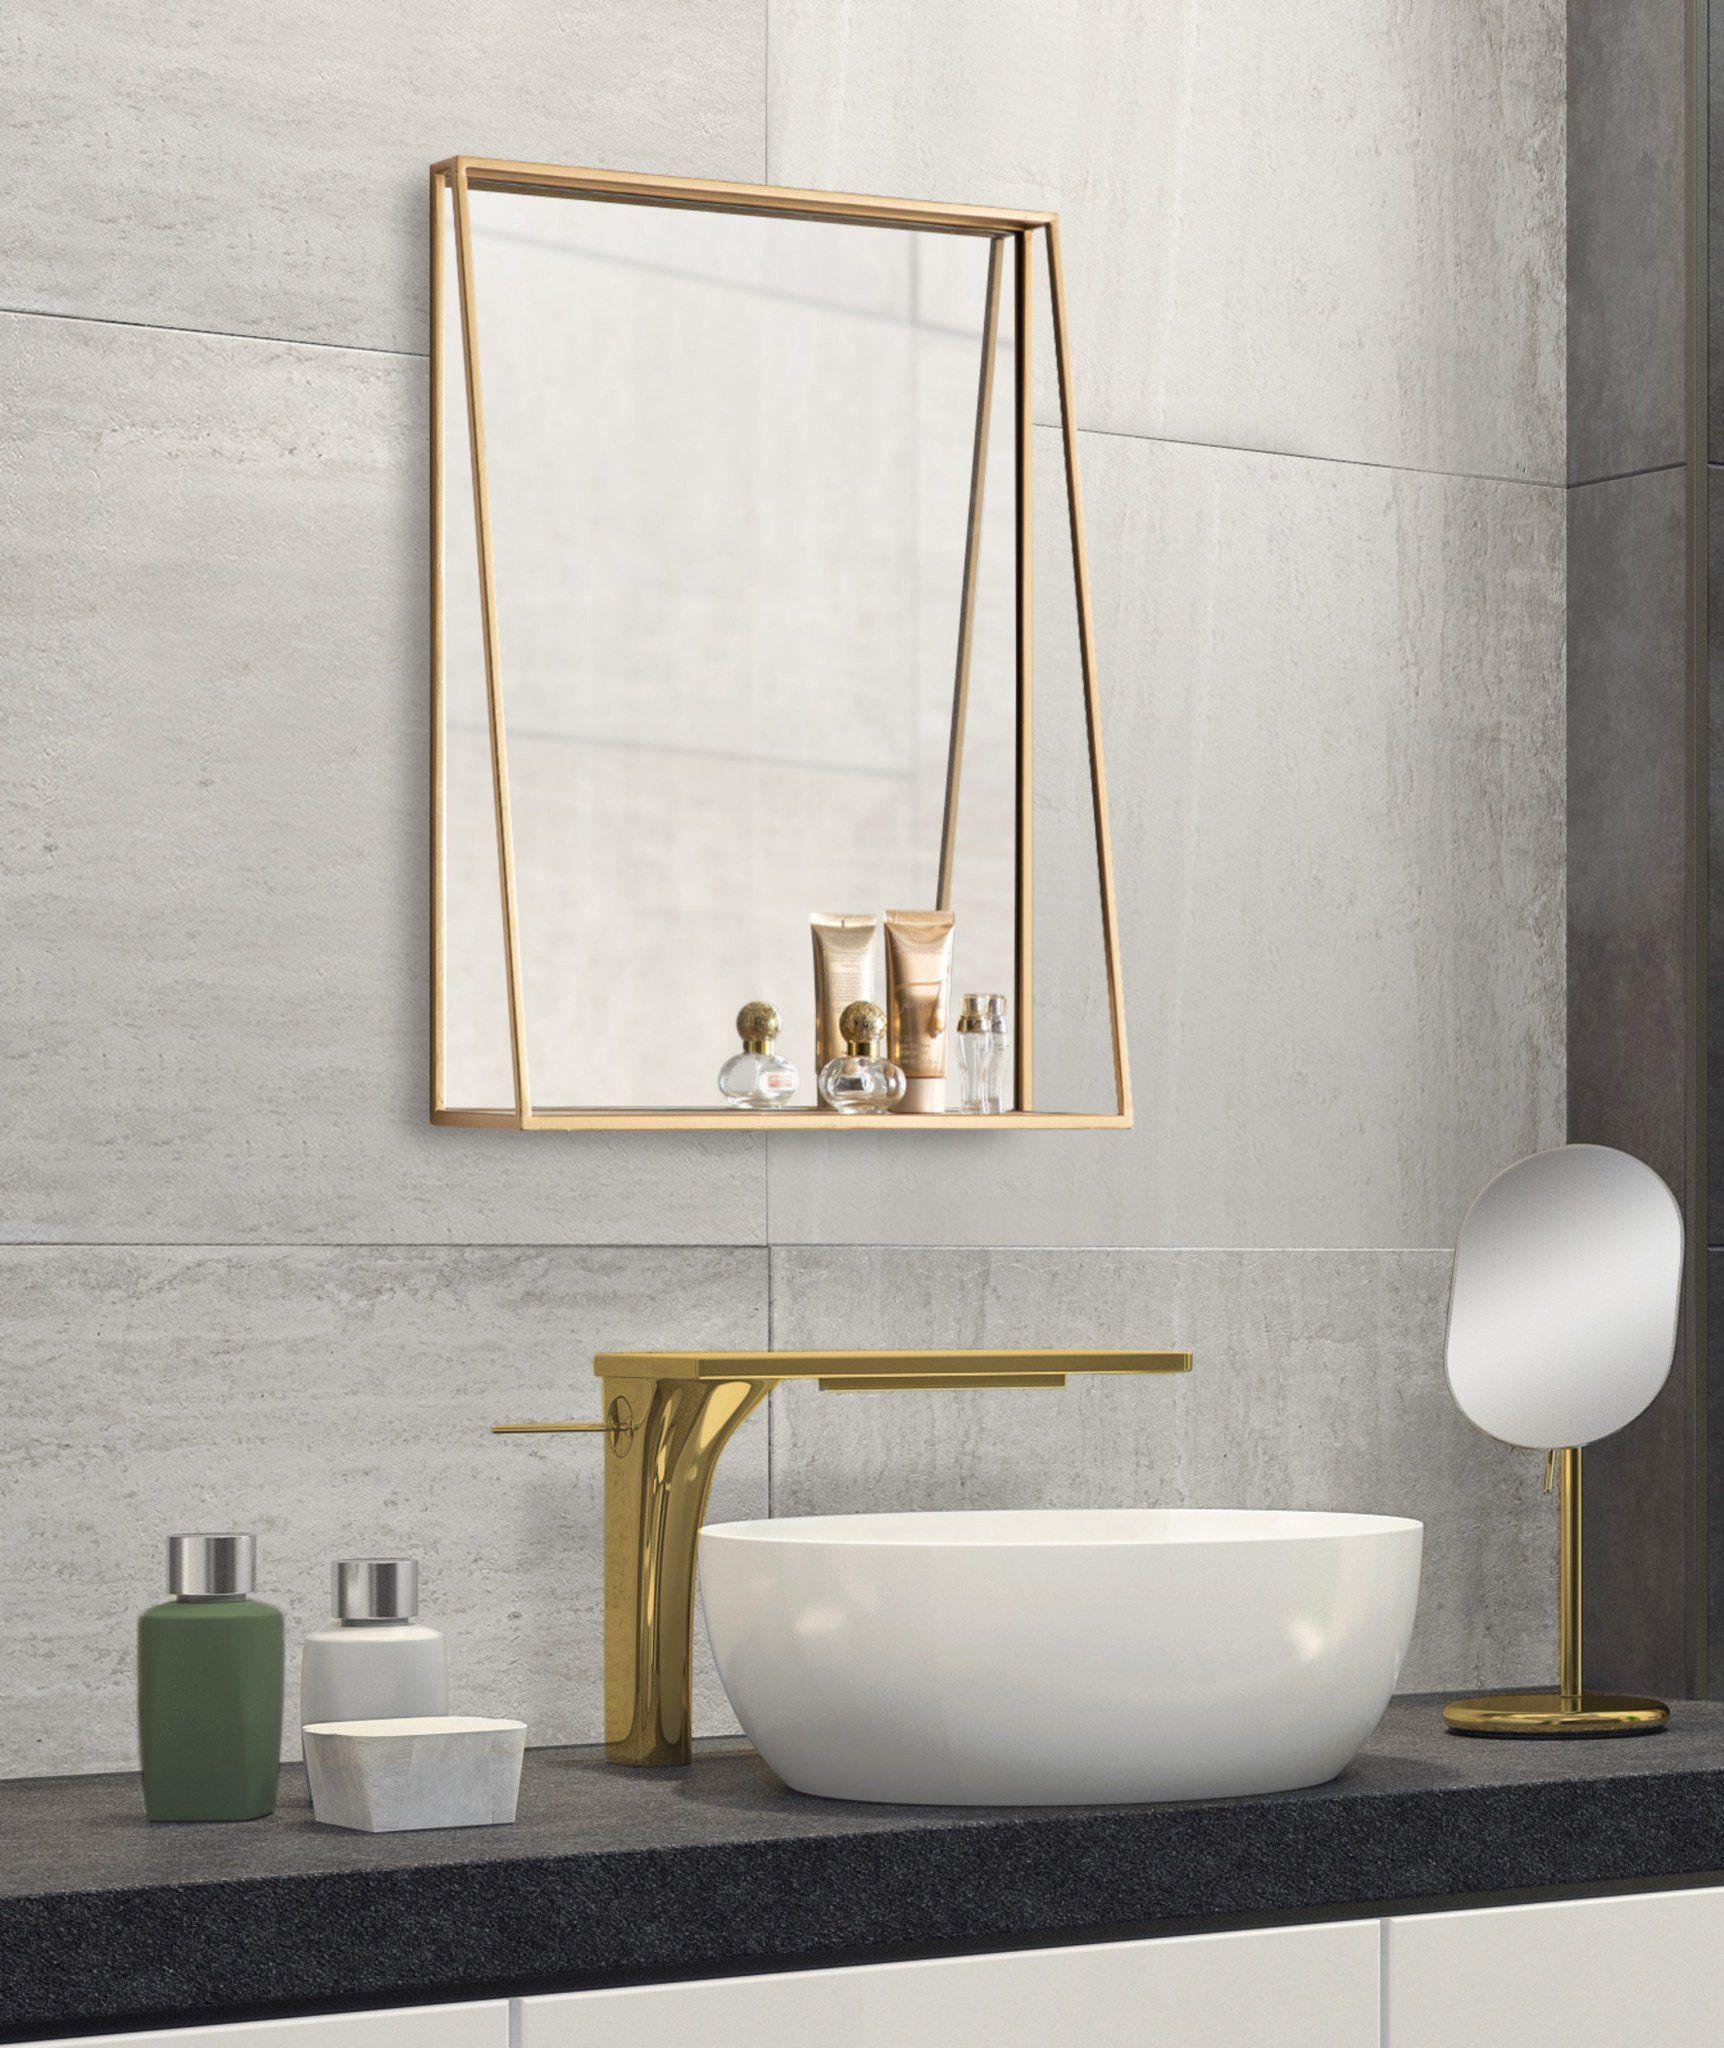 Lintz Metal Framed Mirror With Shelf In 2021 Modern Bathroom Mirrors Unique Bathroom Mirrors Small Bathroom Mirrors [ 2048 x 1724 Pixel ]